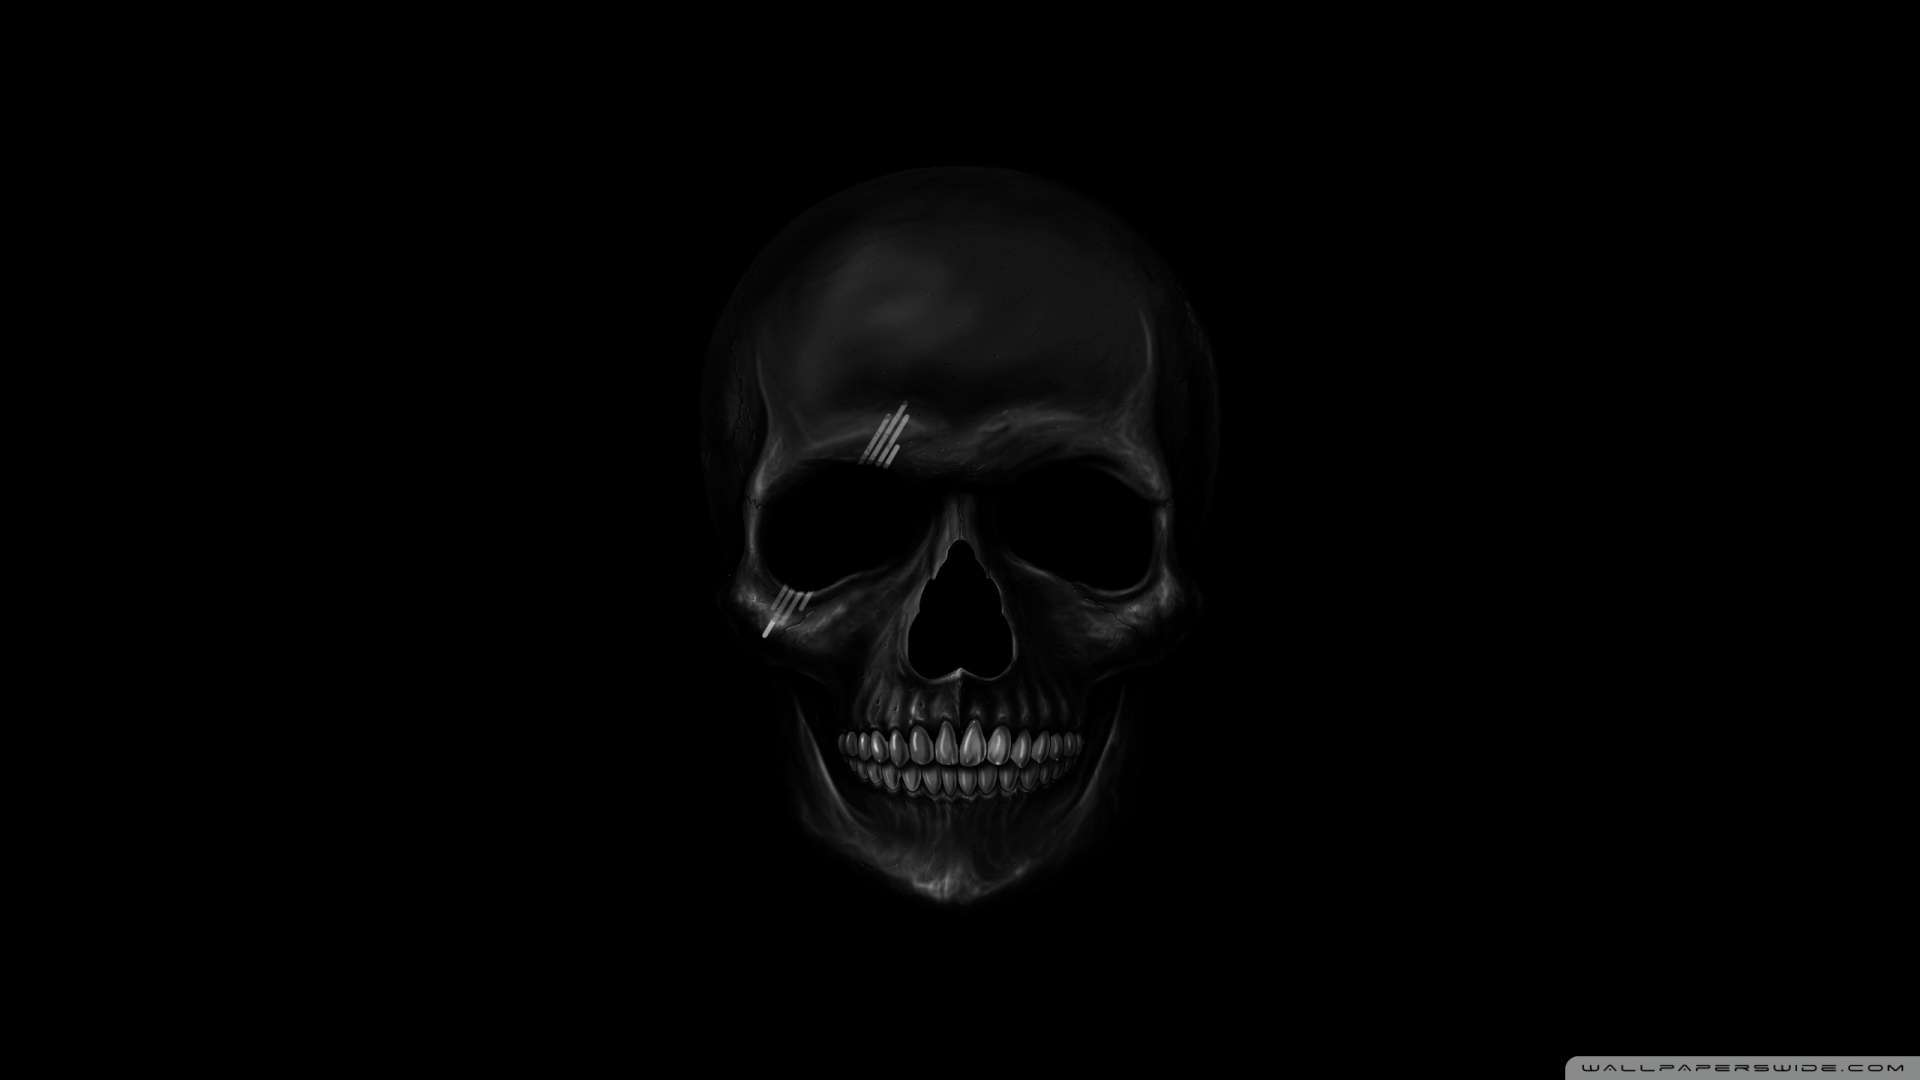 1080p Dark Wallpapers Group (80+)